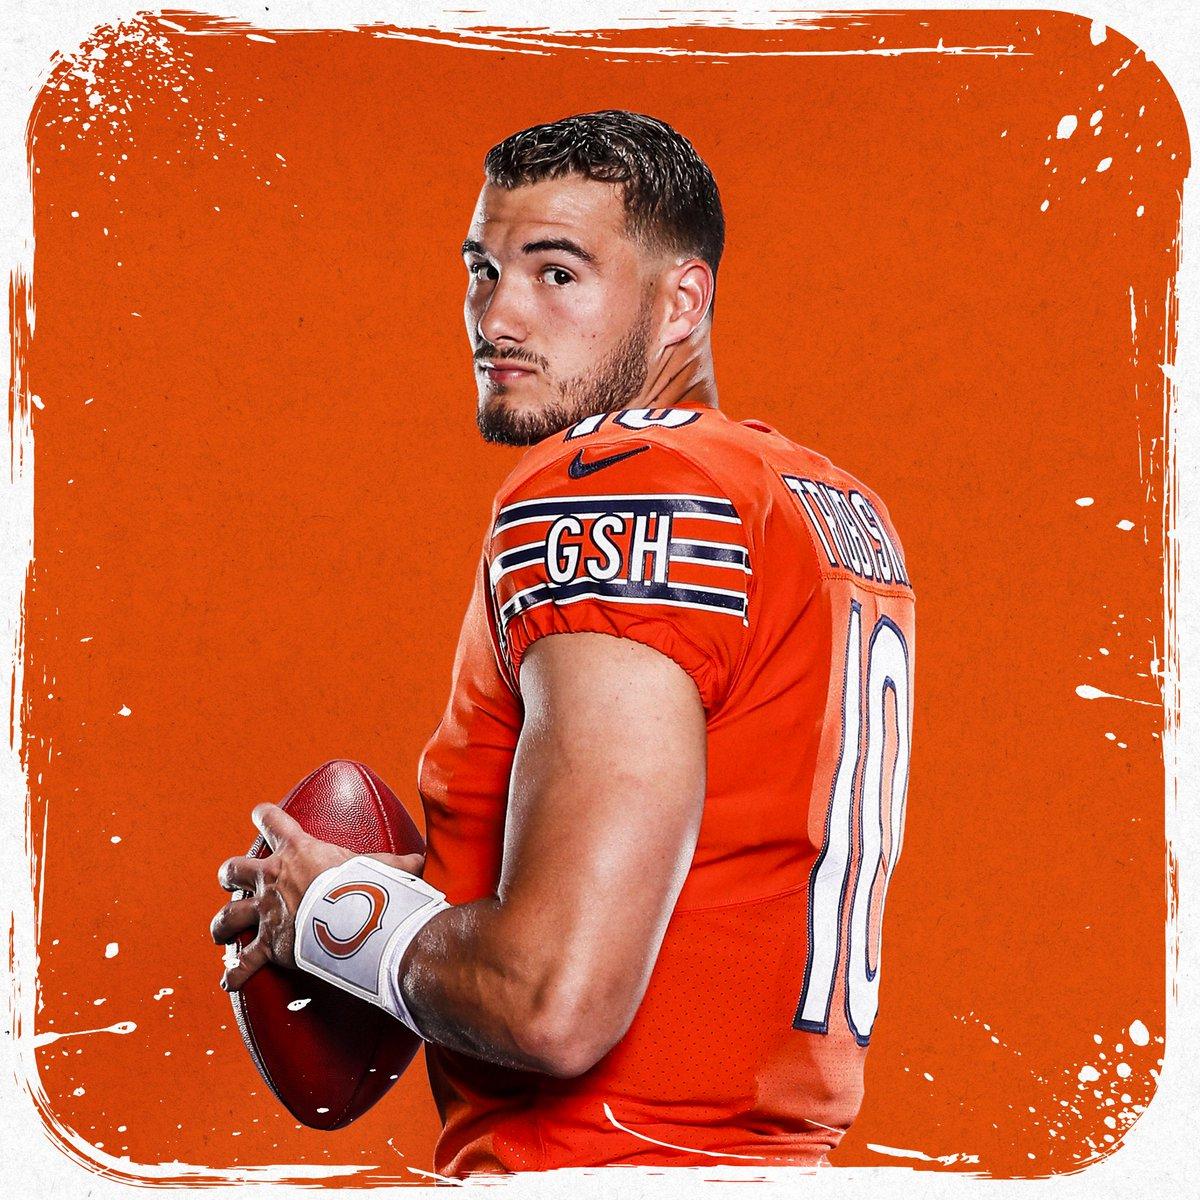 The Bears Orange Unis are Back this Sunday